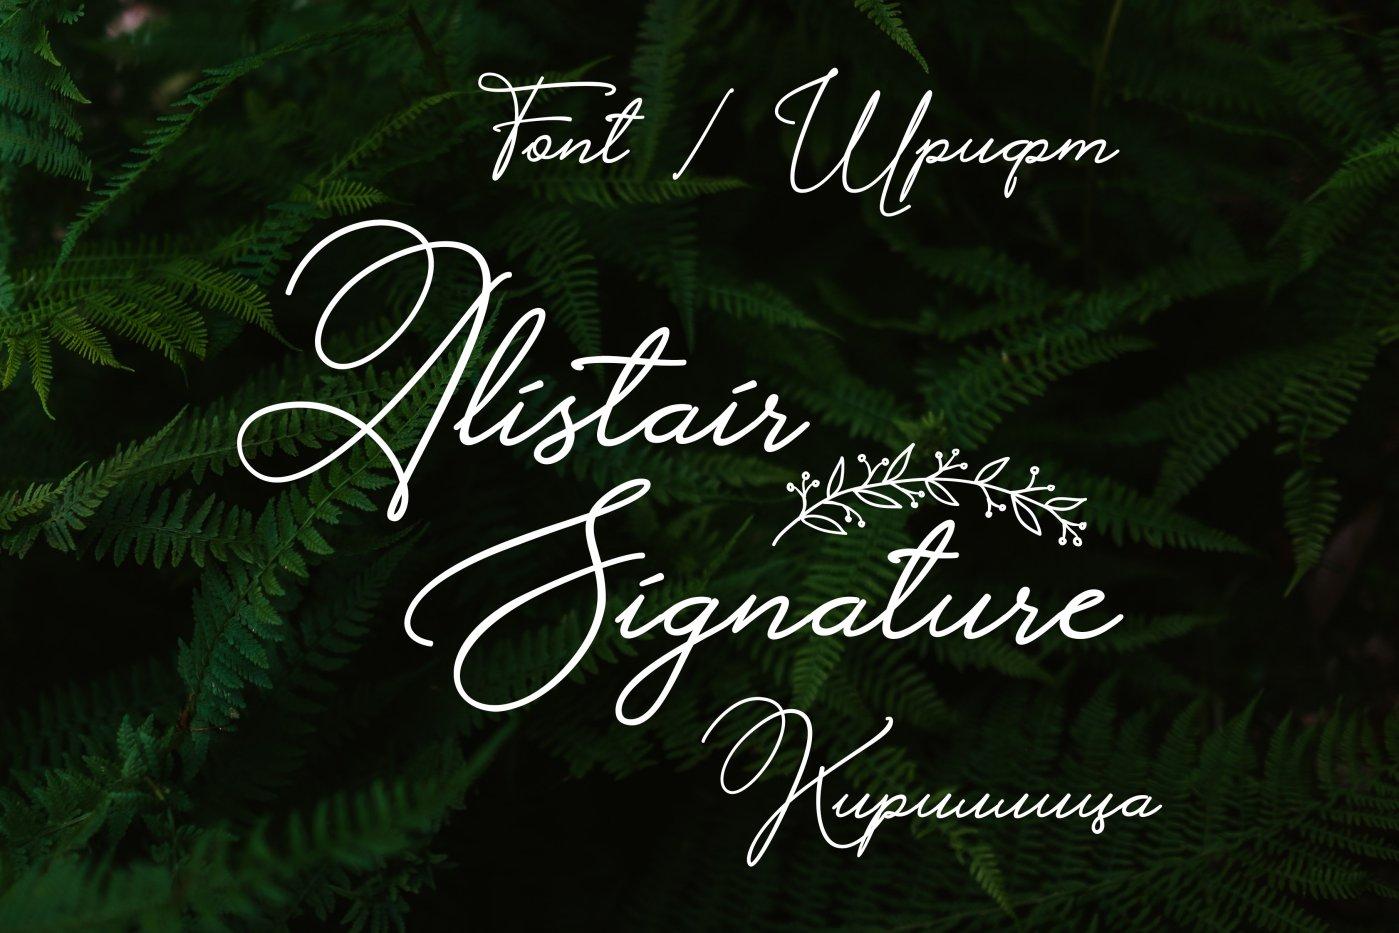 Шрифт Alistair Signature Cyrillic